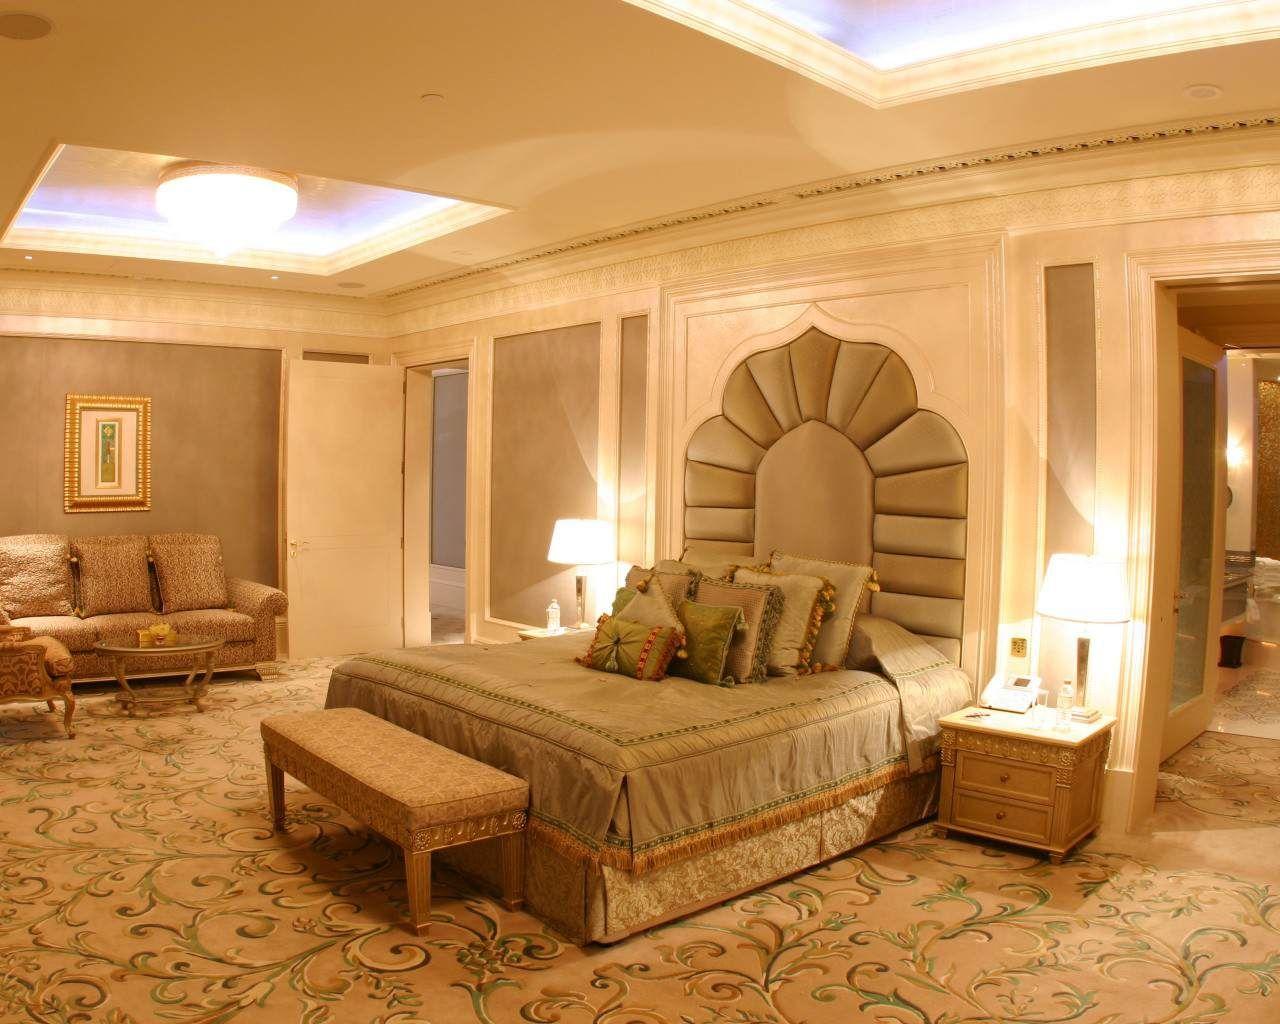 15 Amazing Royal Bedroom Design  Royal Bedroom Design Khaleej   ToyNuts    Interior Designs. 15 Amazing Royal Bedroom Design  Royal Bedroom Design Khaleej